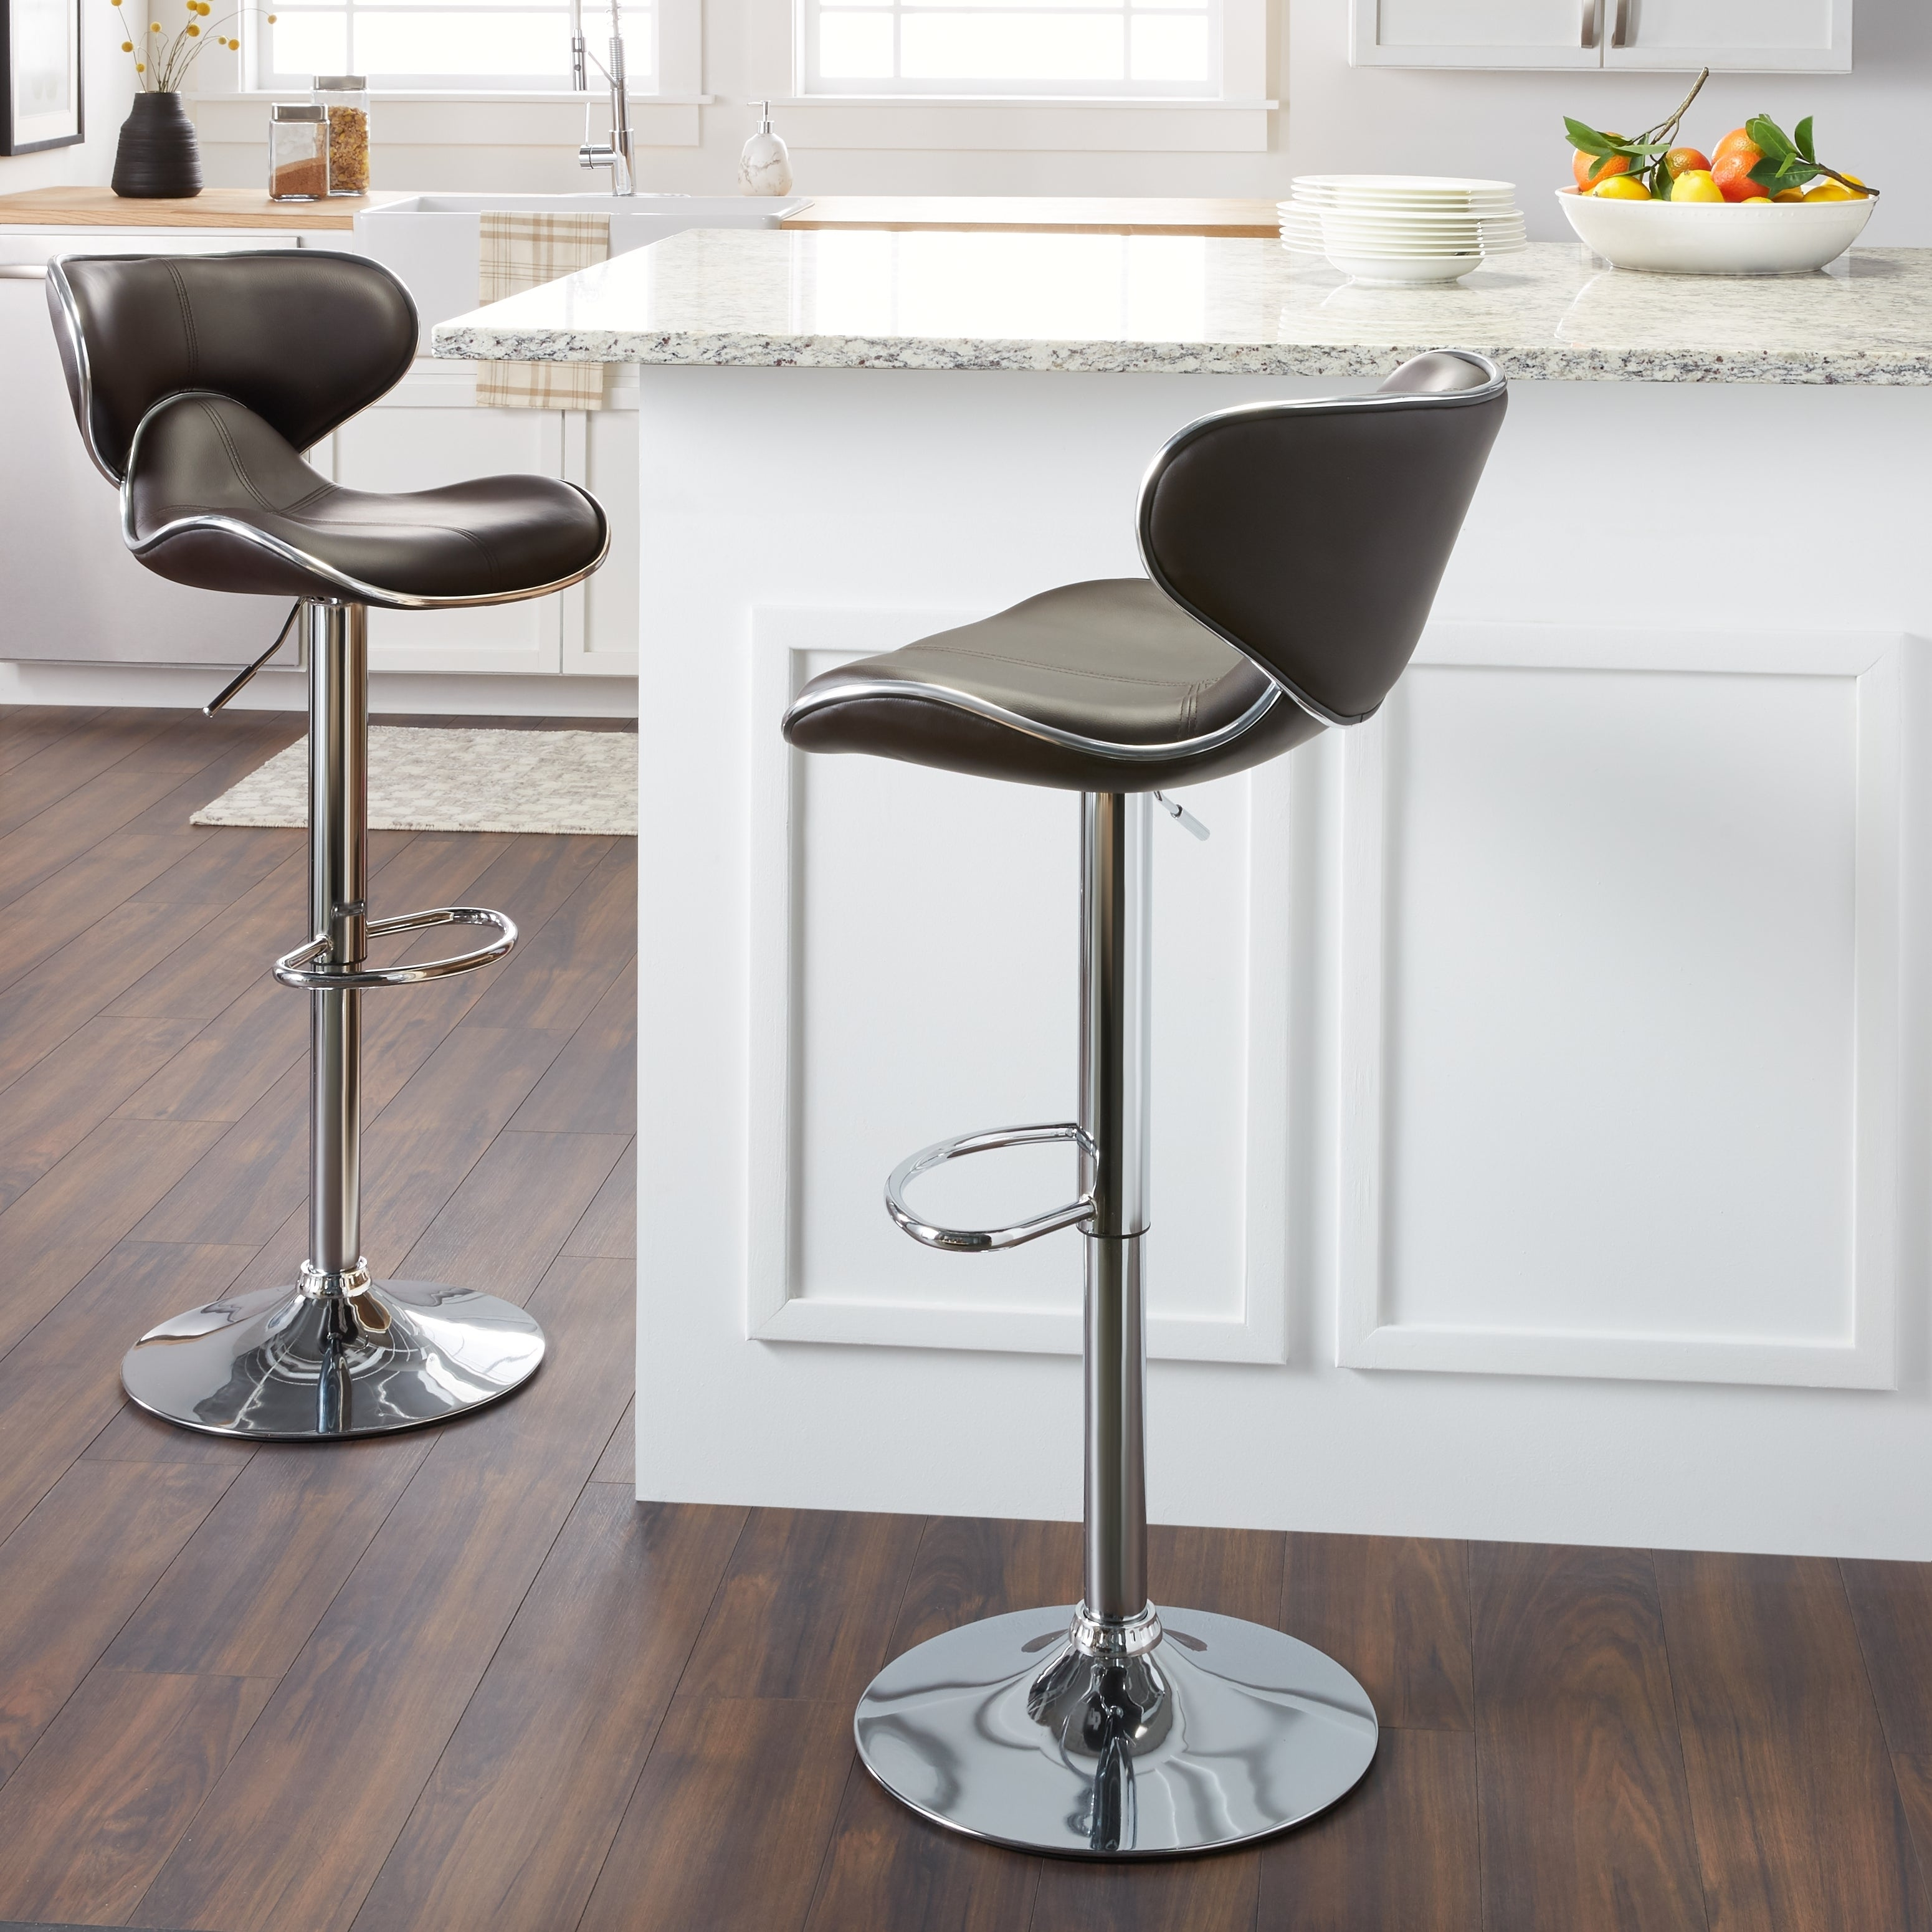 Enjoyable Masaccio Leatherette Airlift Adjustable Swivel Barstool Set Of 2 Uwap Interior Chair Design Uwaporg